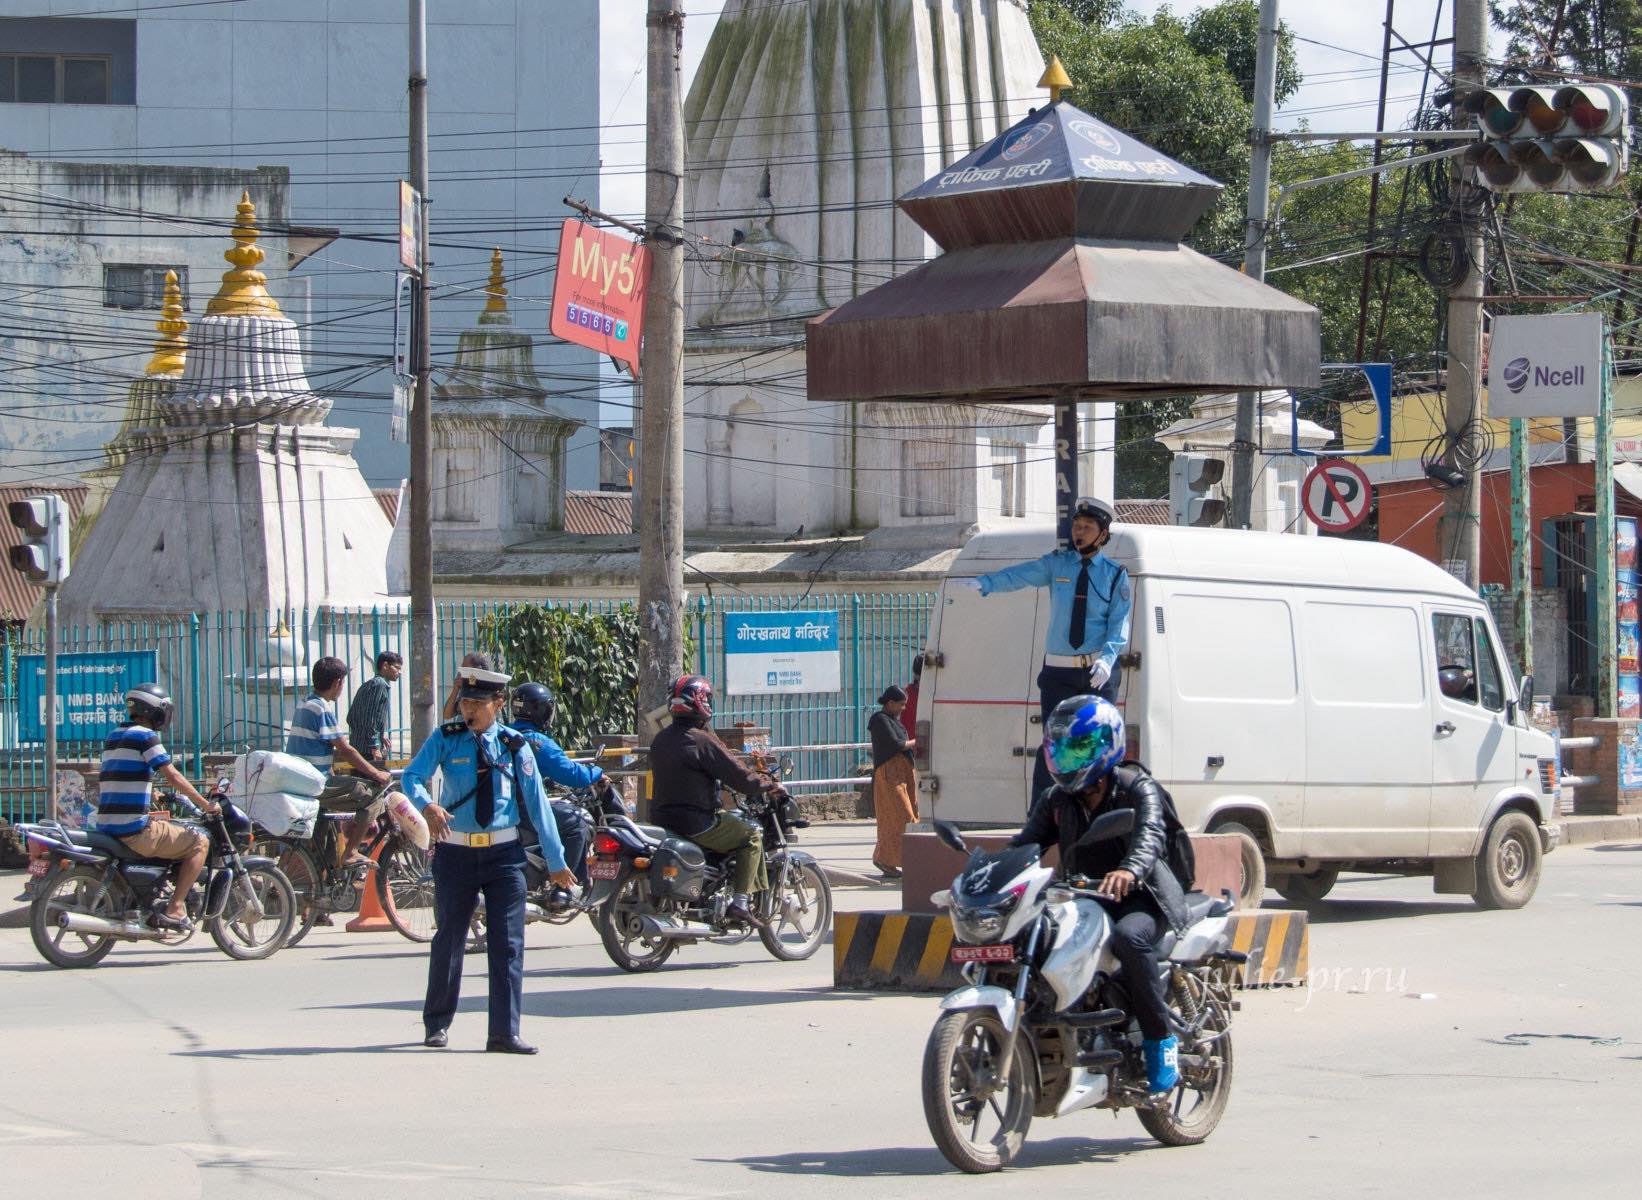 Непал, Катманду, регулировщики